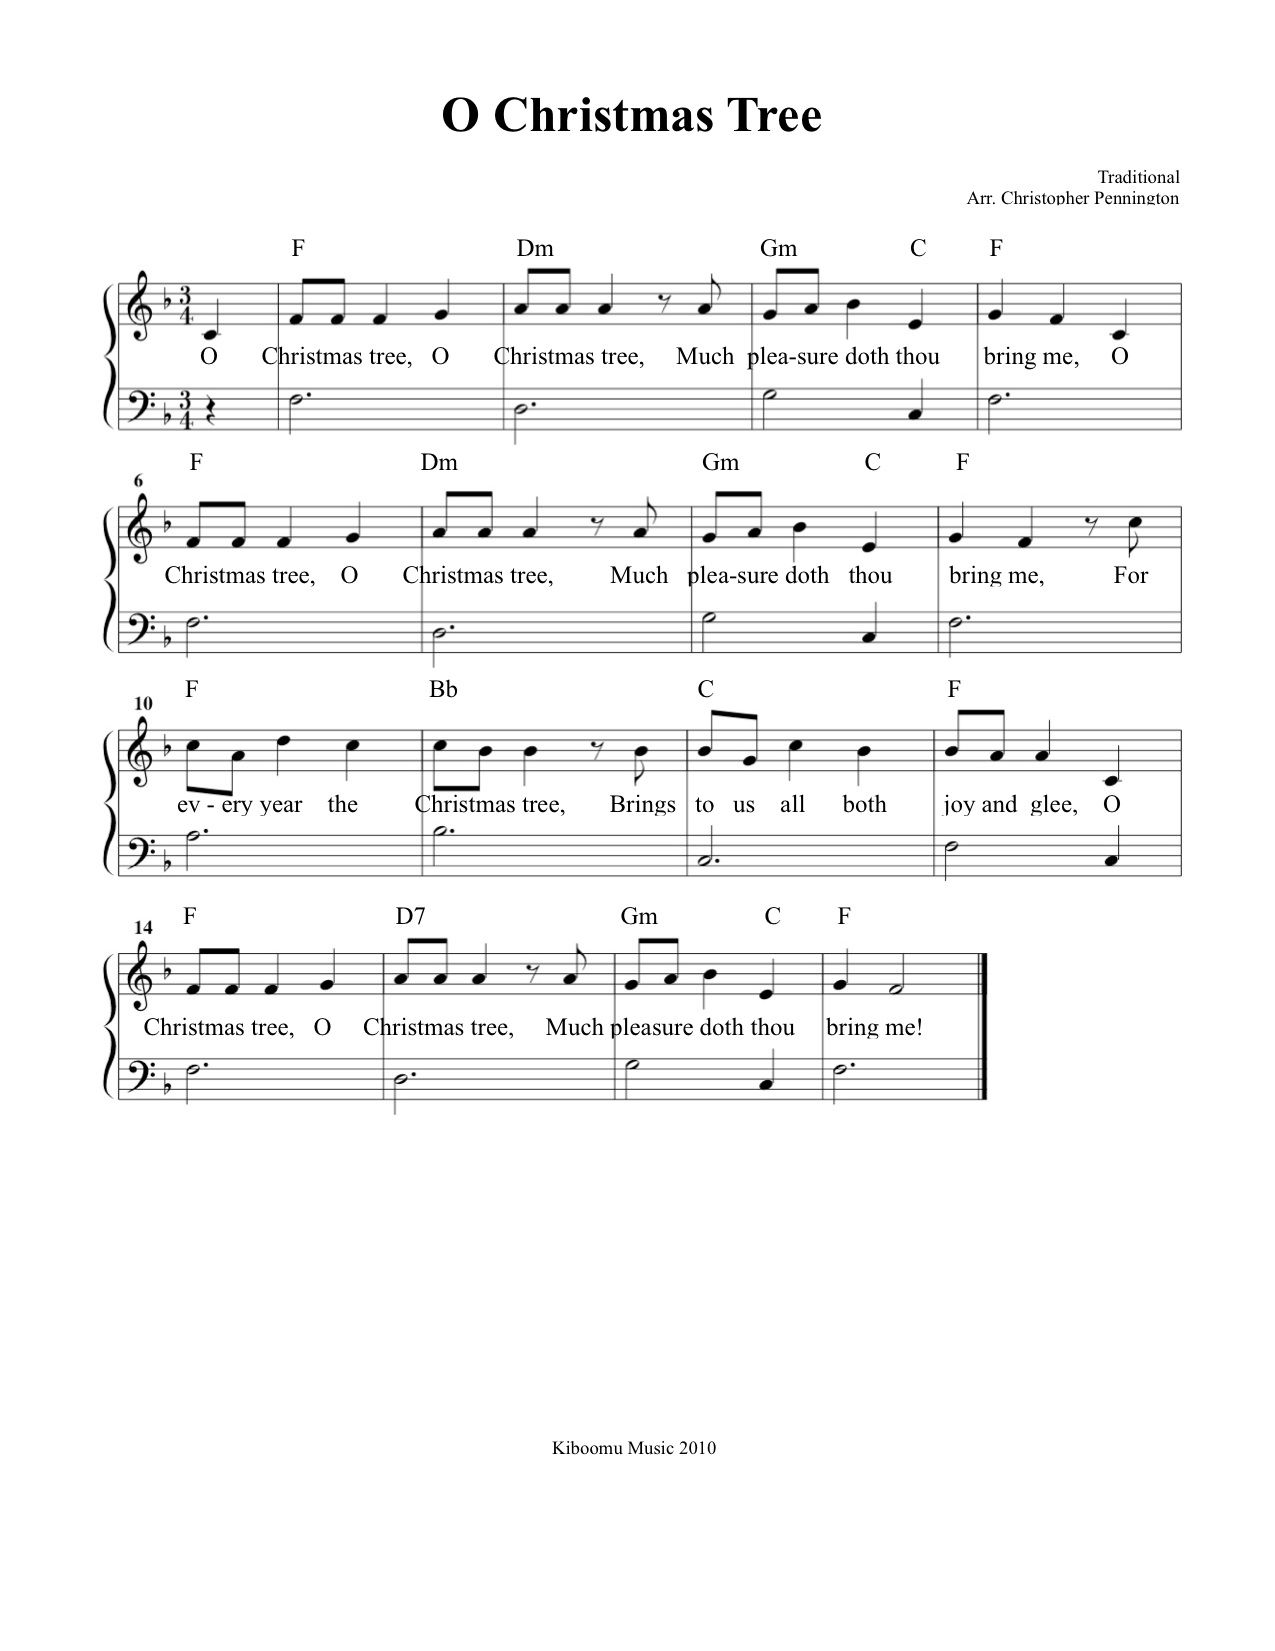 O-Christmas-Tree-Sheet-Music.jpg (1275×1651) | Sheet music ...